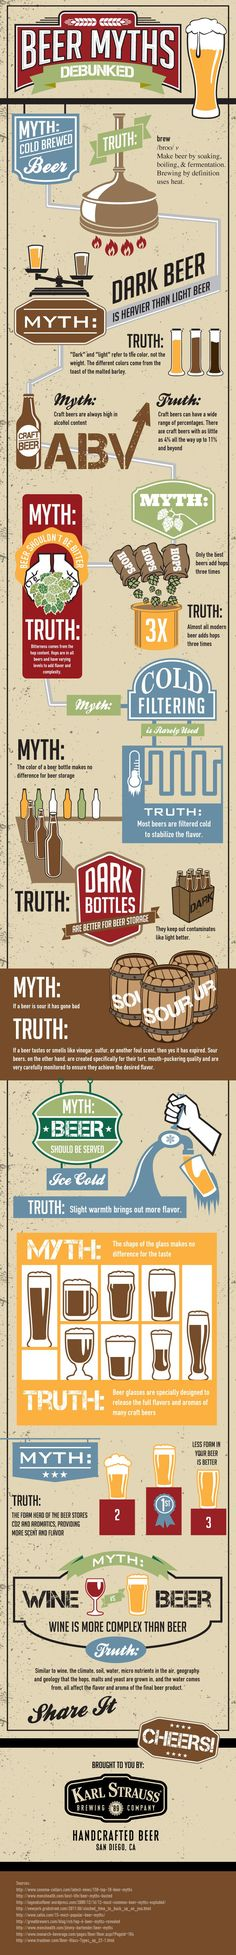 Beer Myths Debunked,